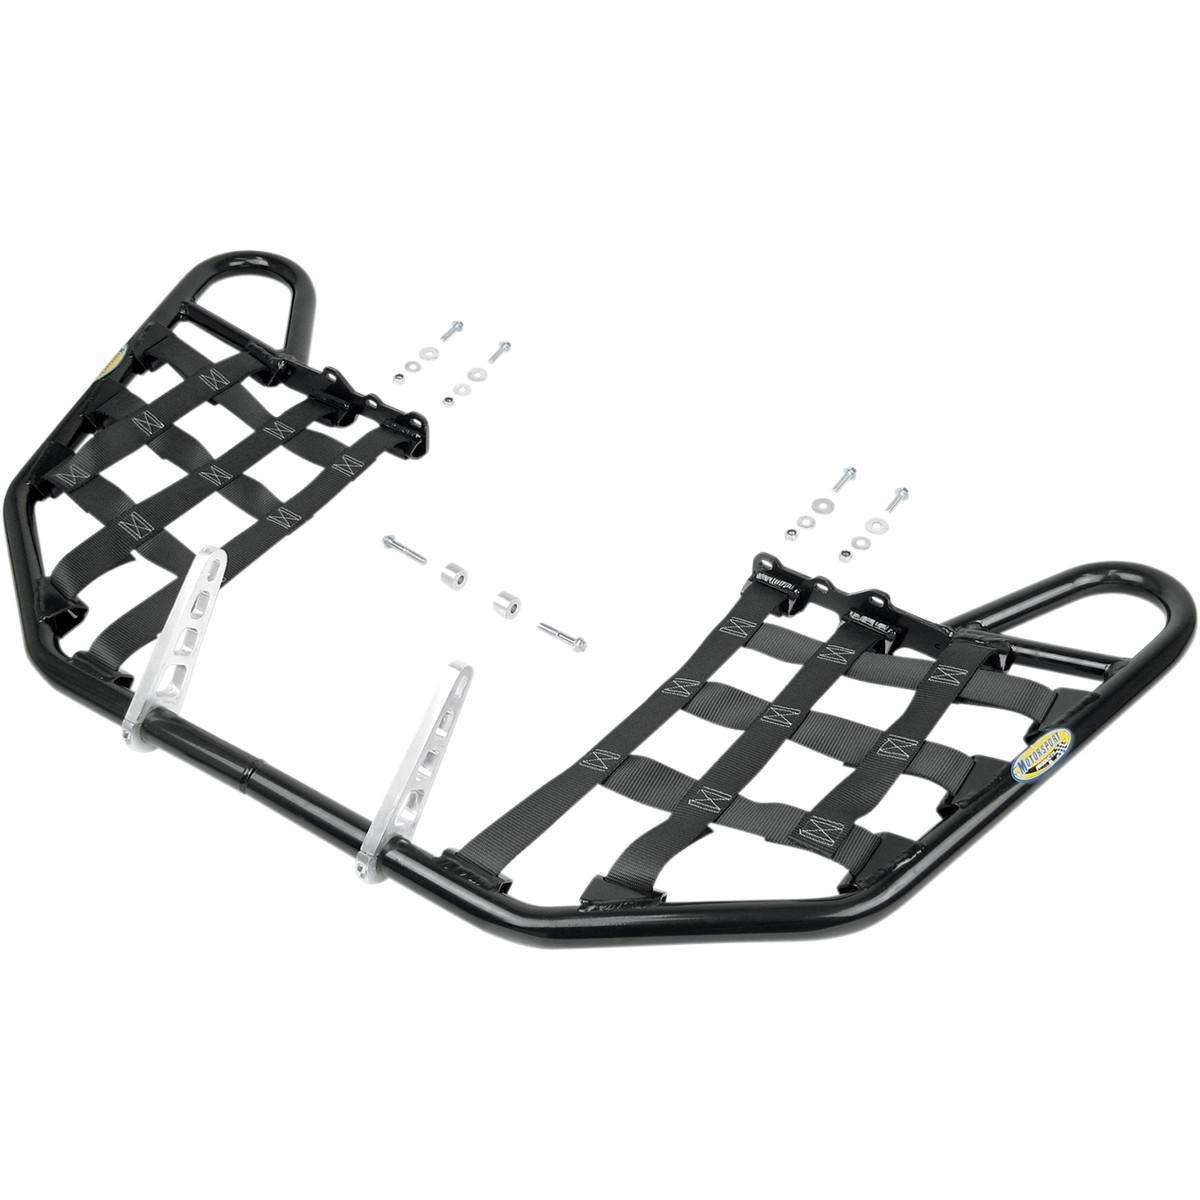 Motoworks EZ-FIT Nerf Bars - Black 81-1412